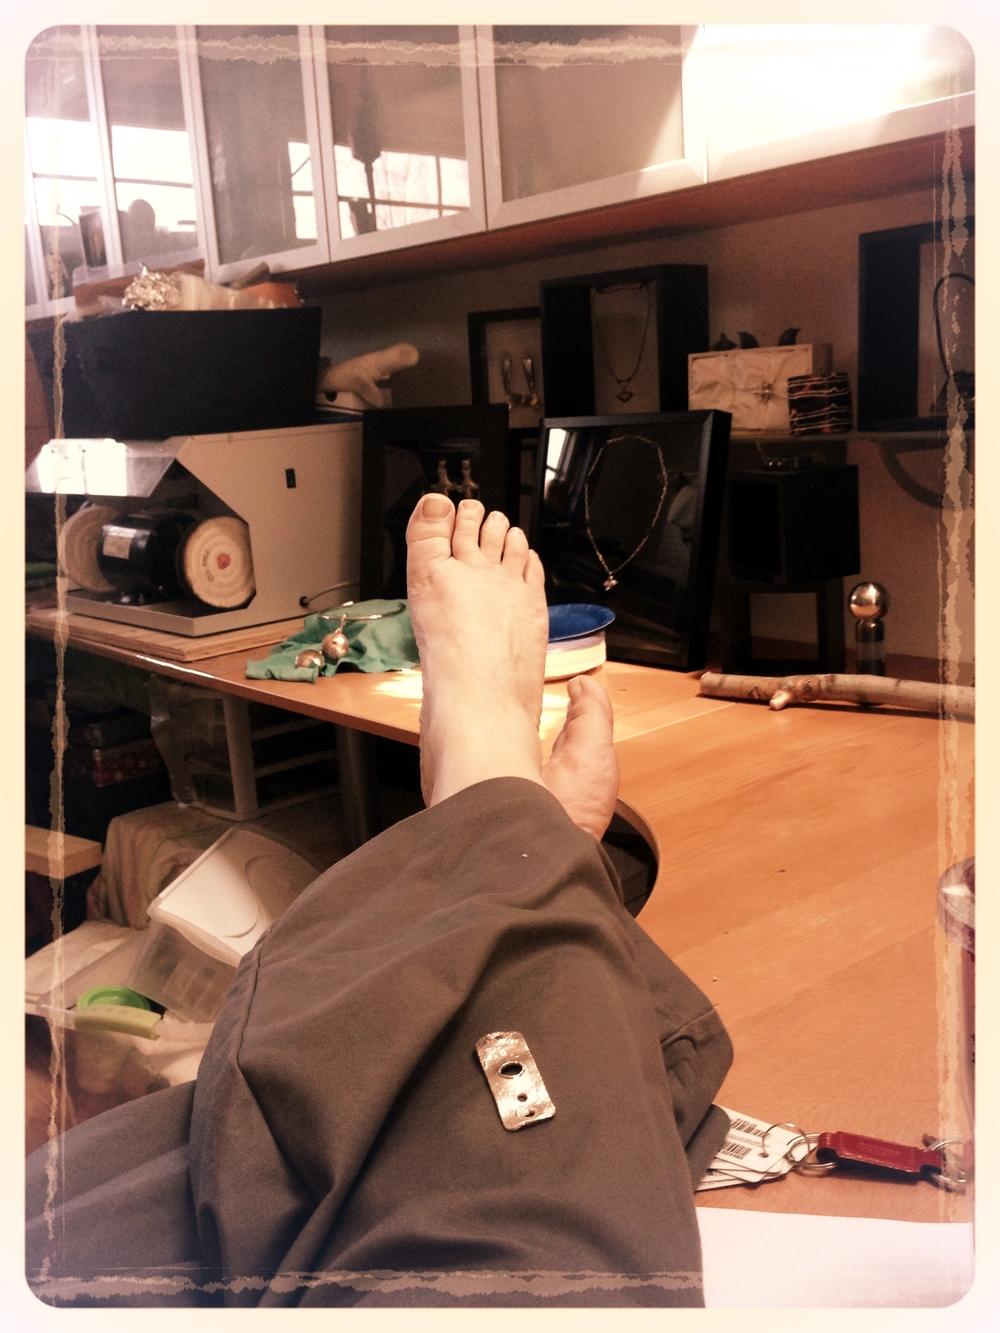 I LOVE my job! ... but I think I need a pedicure...